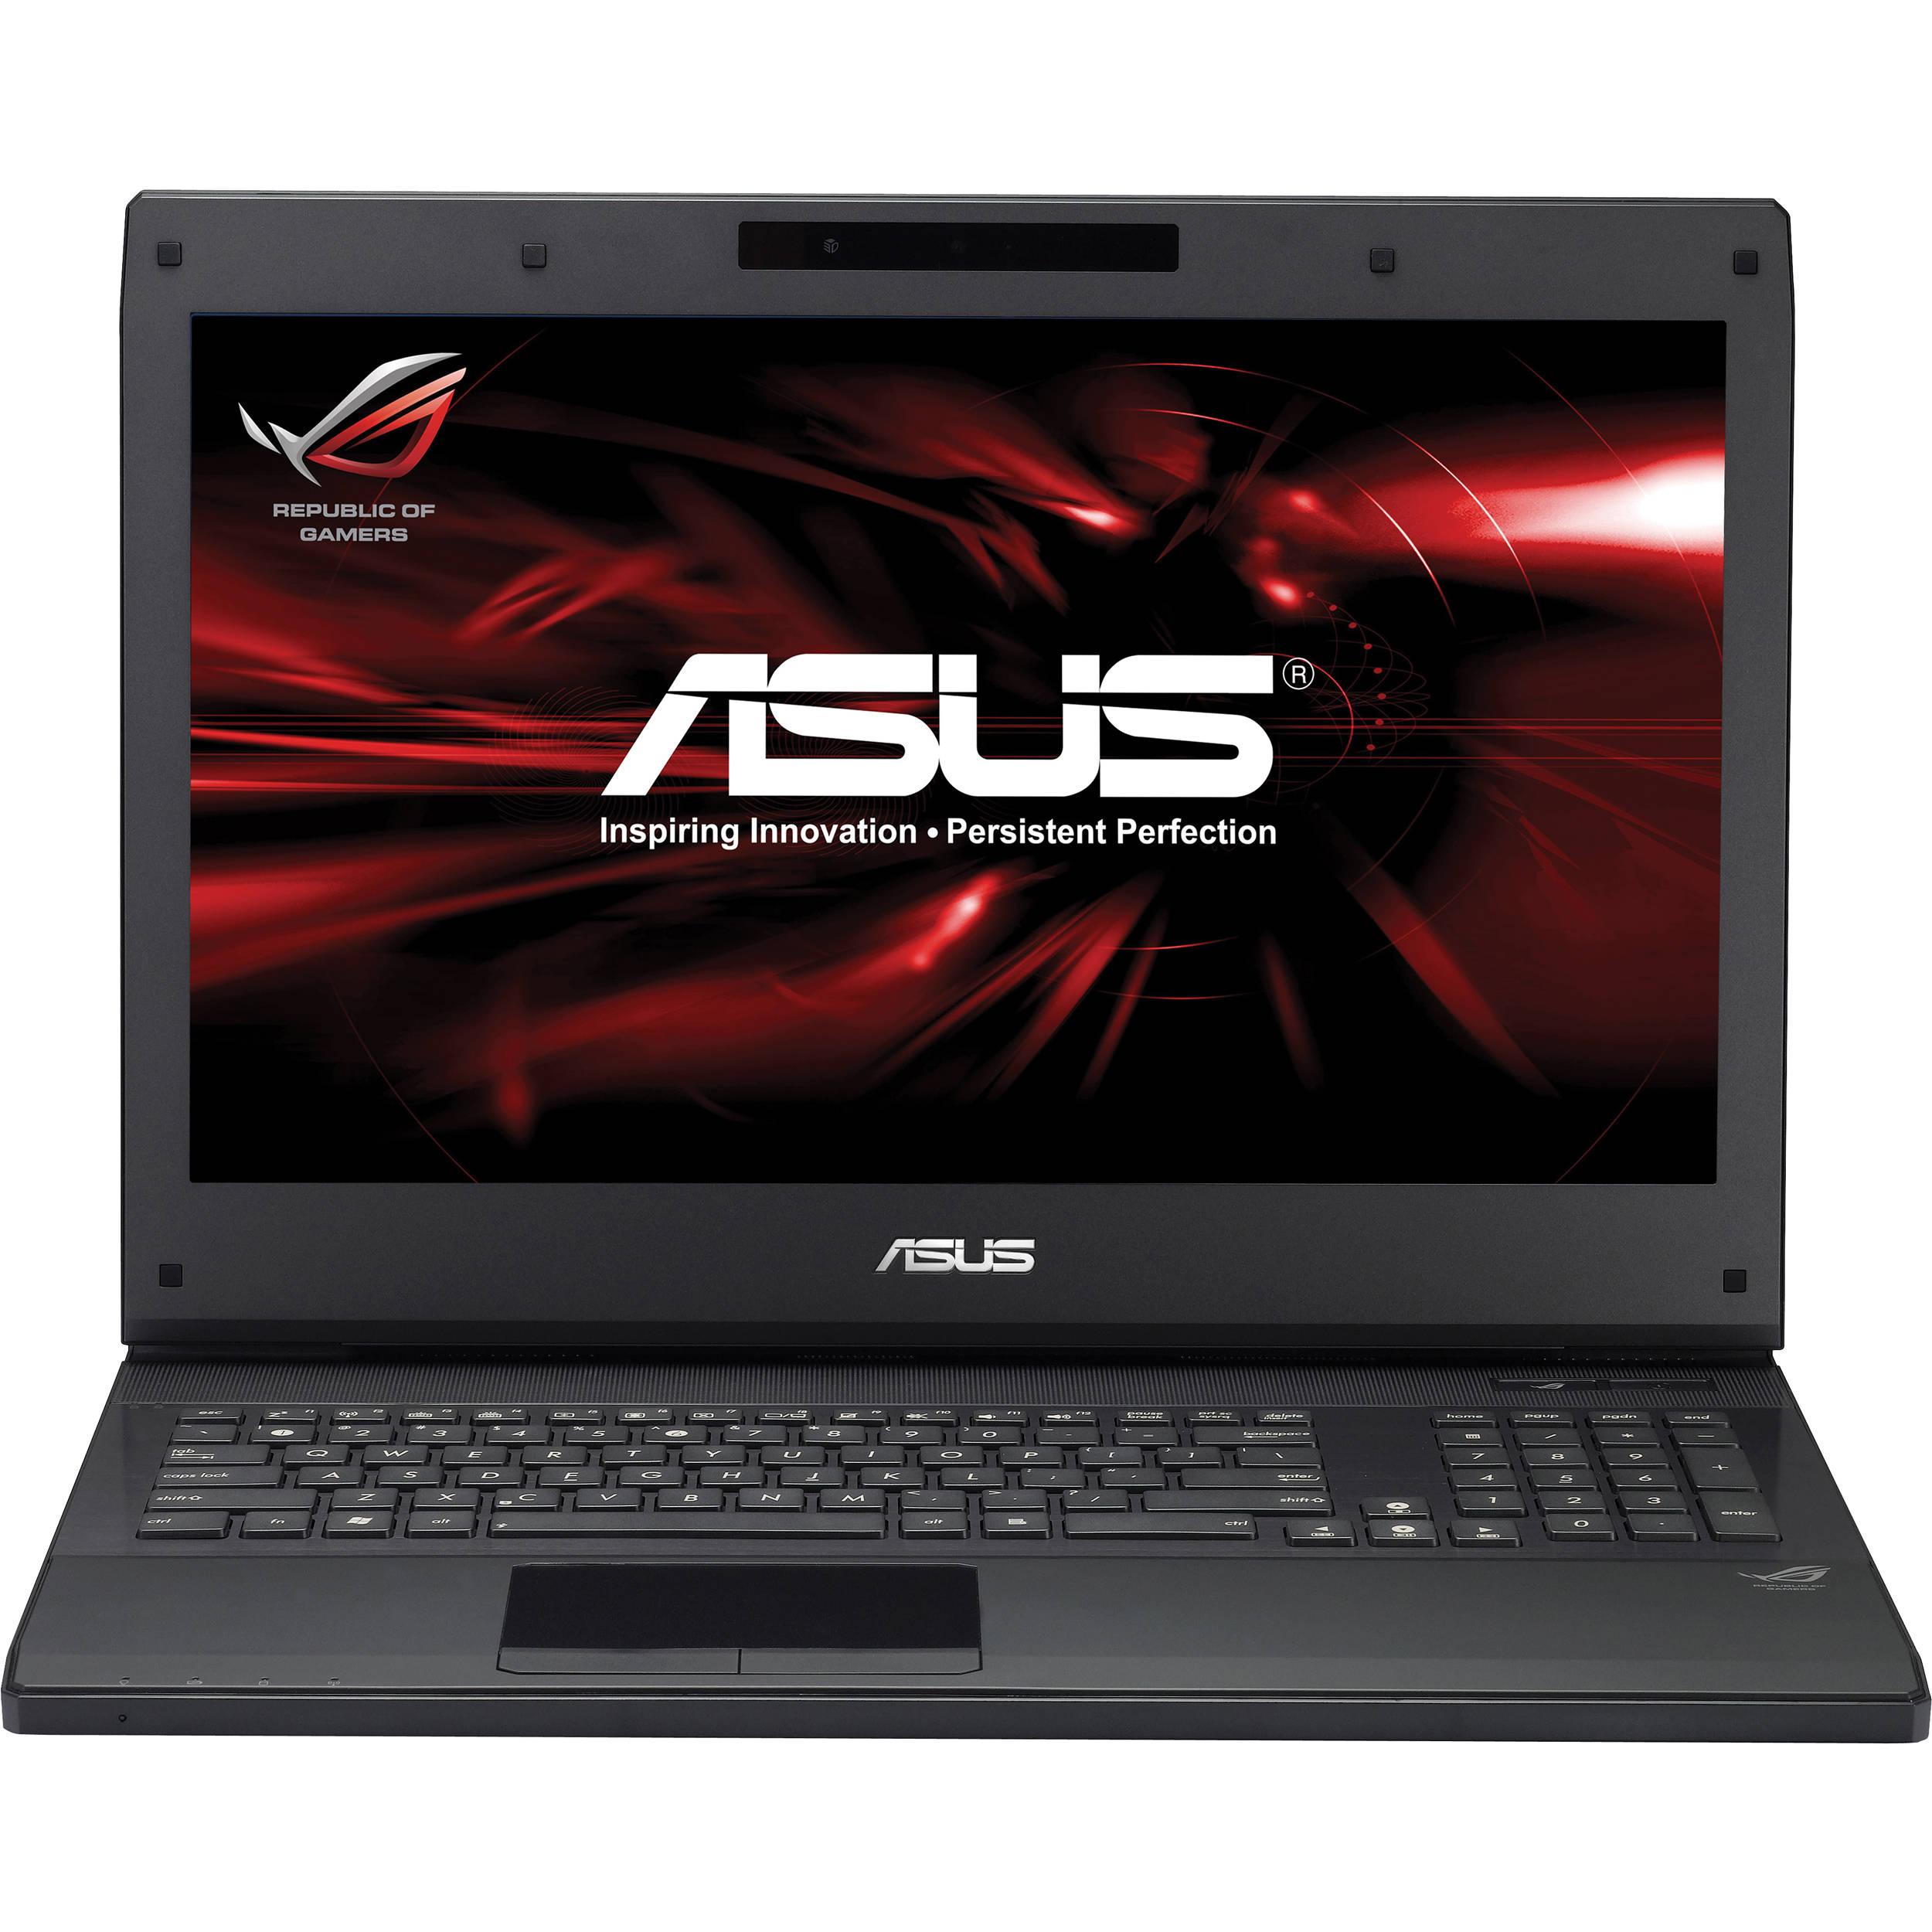 asus g74sx a2 17 3 notebook computer black g74sx a2 b h rh bhphotovideo com Asus G74SX Driver Asus G50